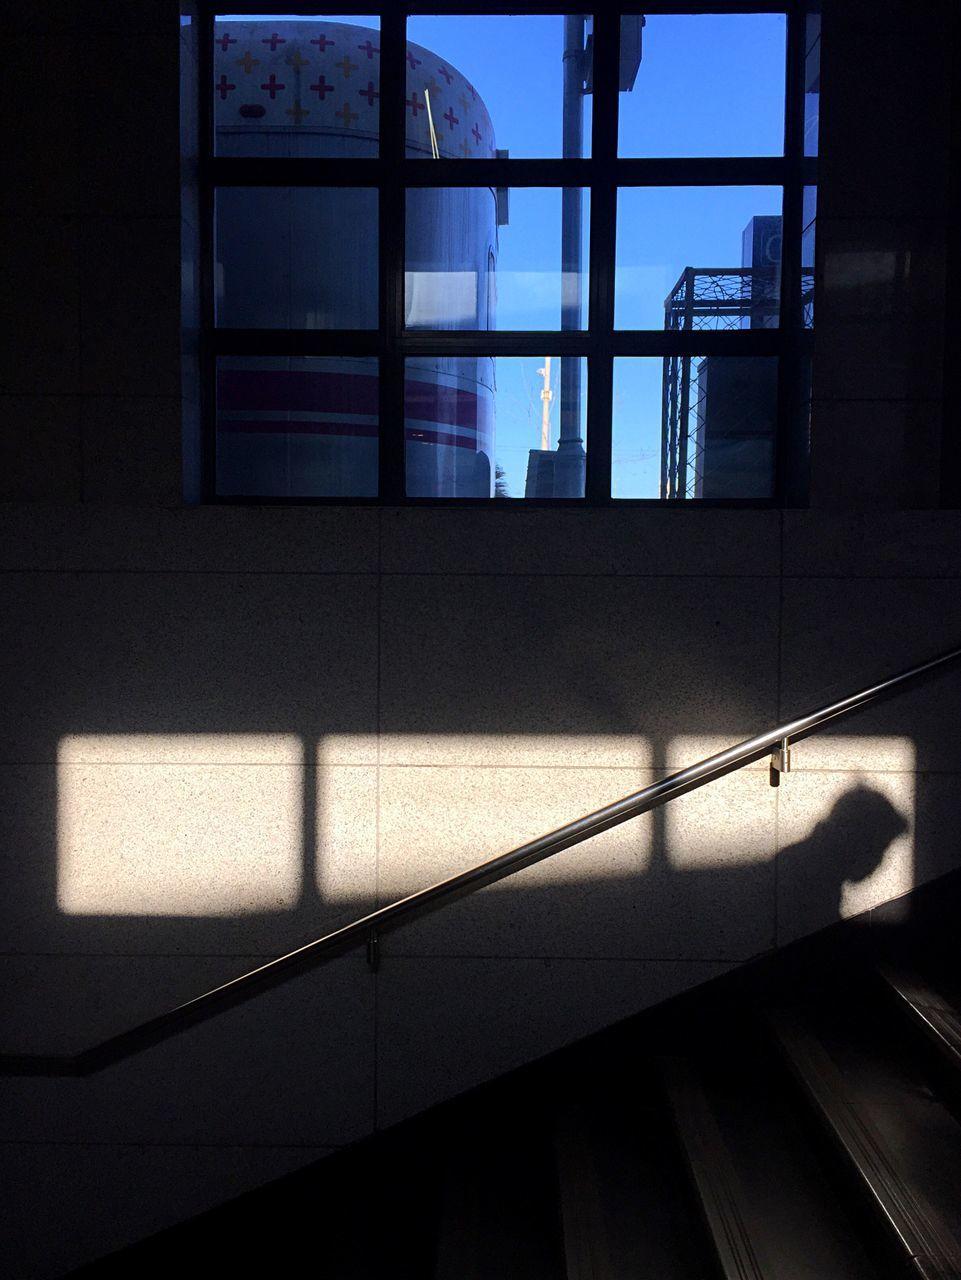 Sunlight Falling On Wall